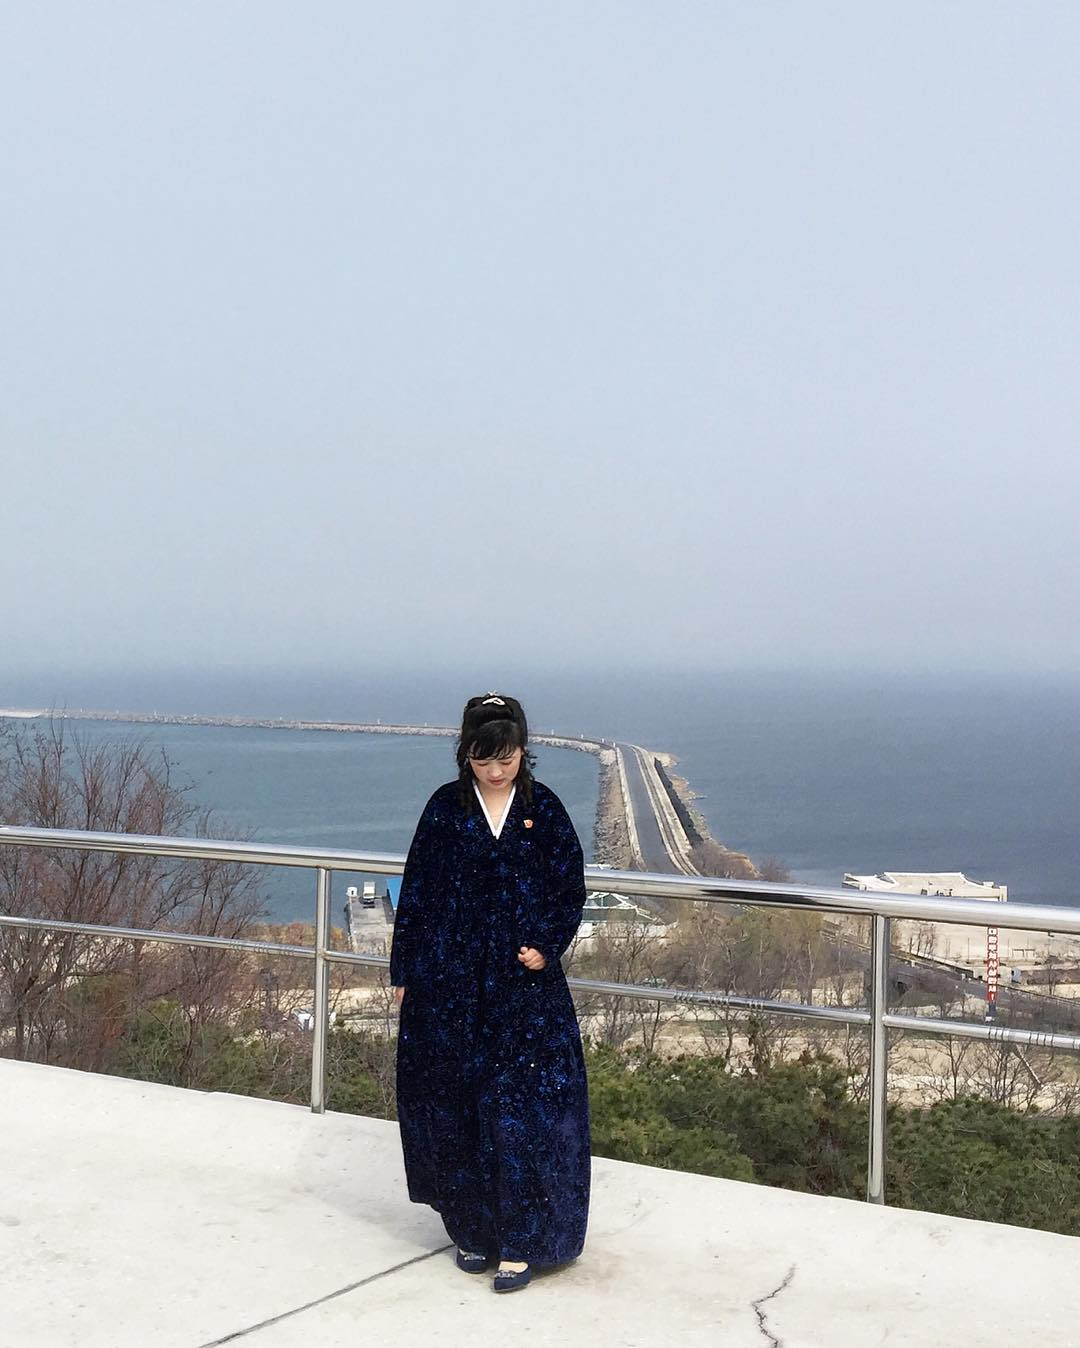 Nampo, DPRK